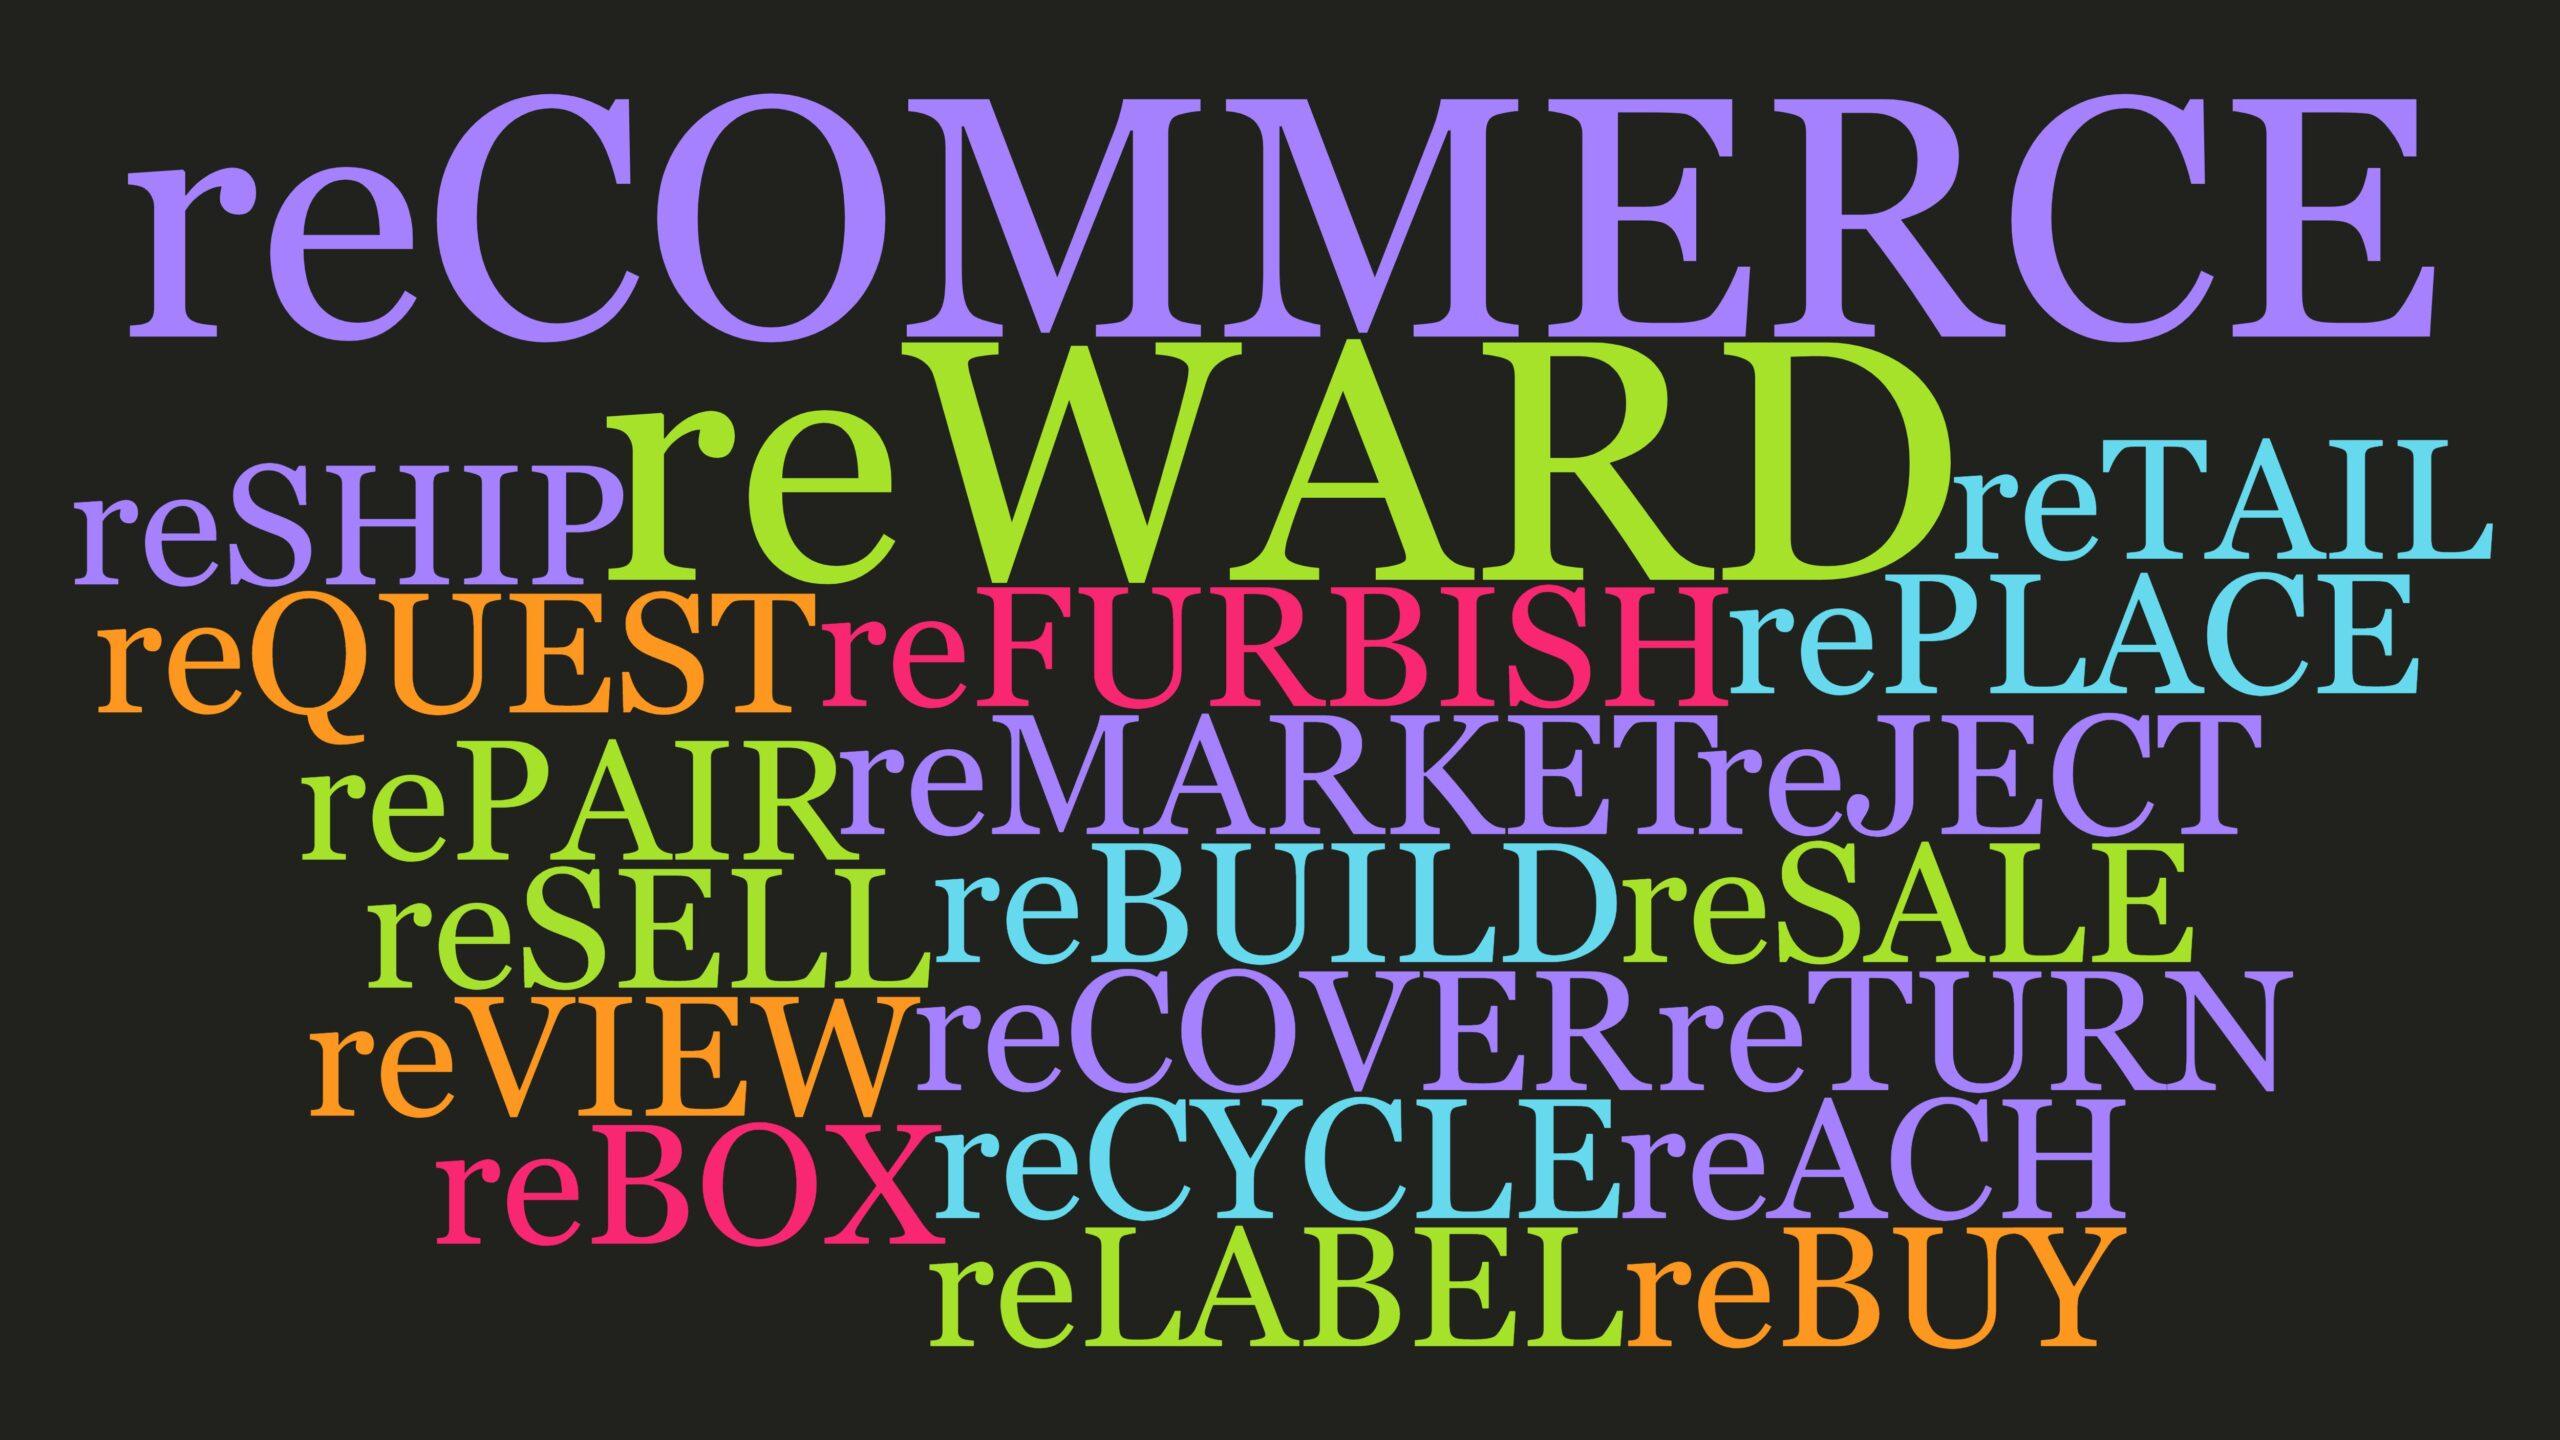 eCommerce reCOMMERCE reWARD